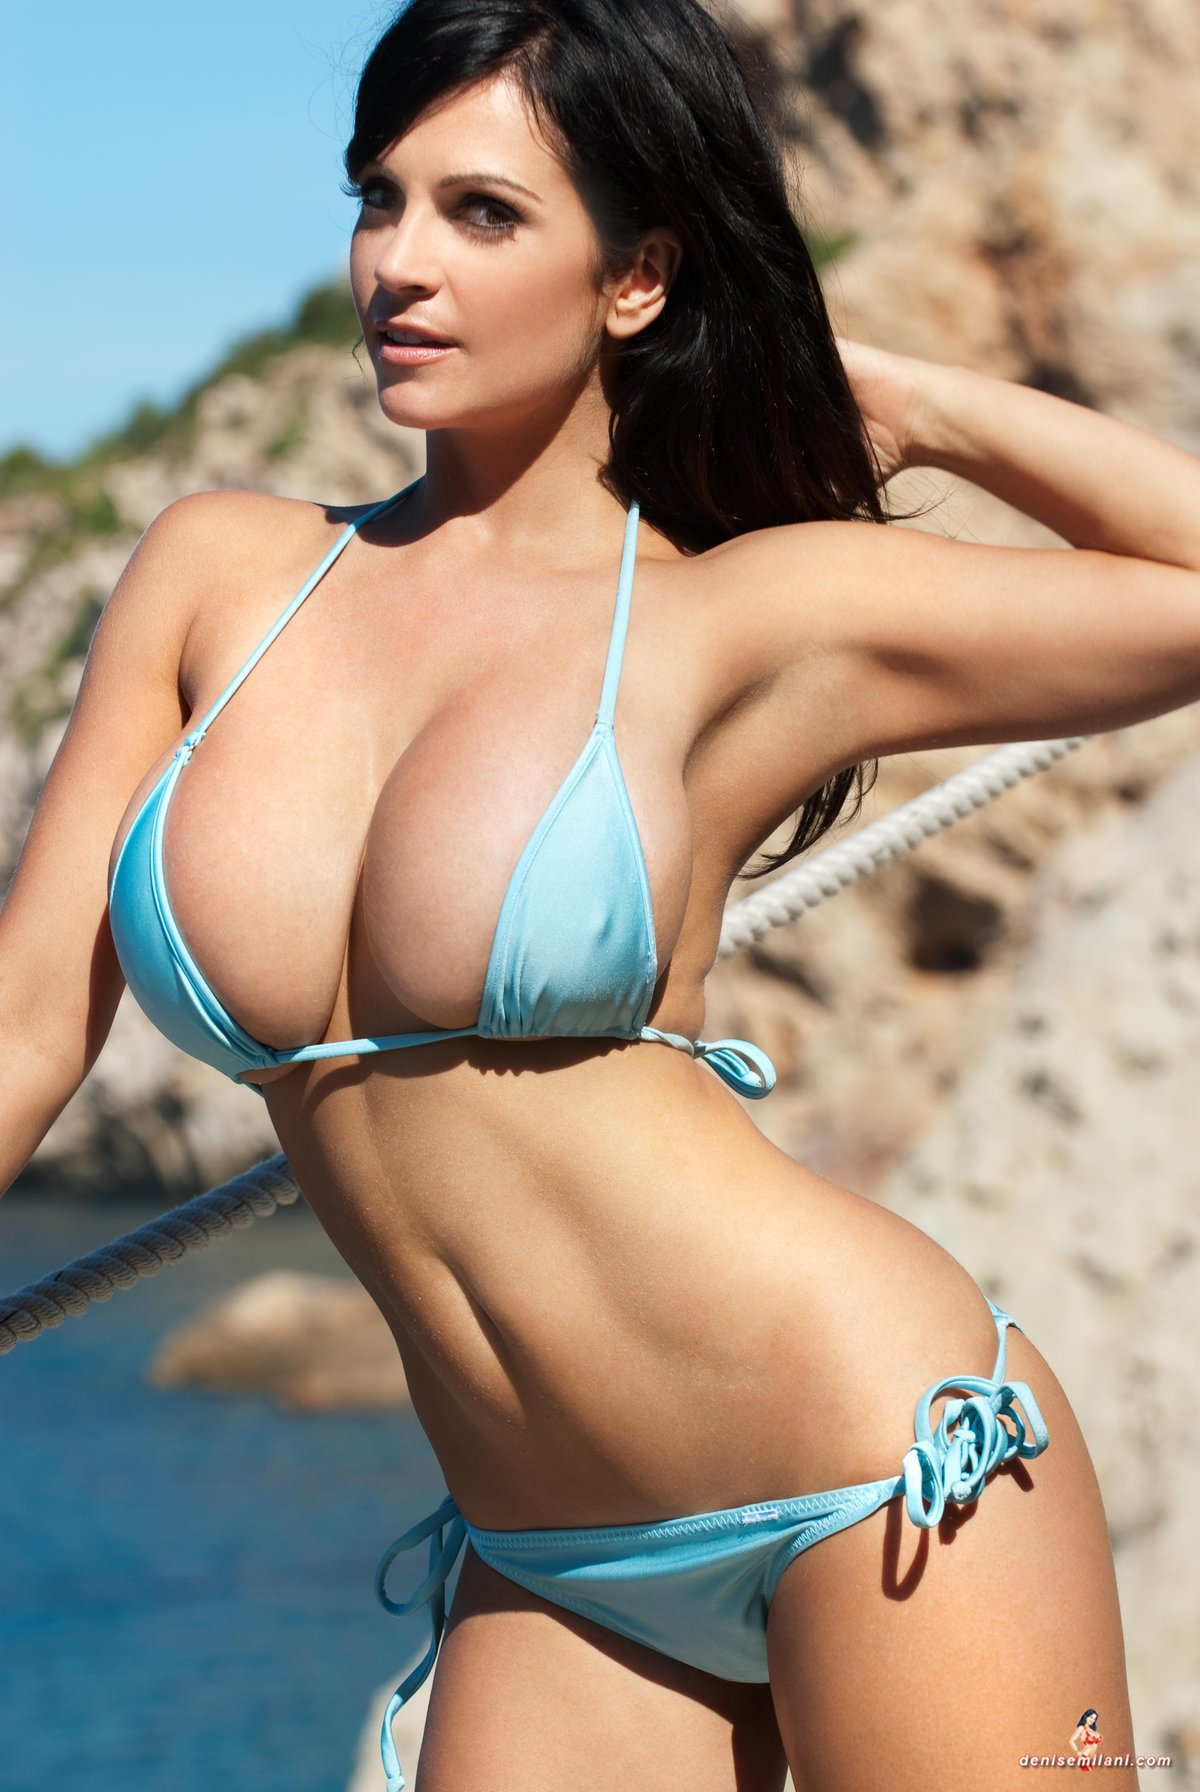 Nude Busty Milf Pics